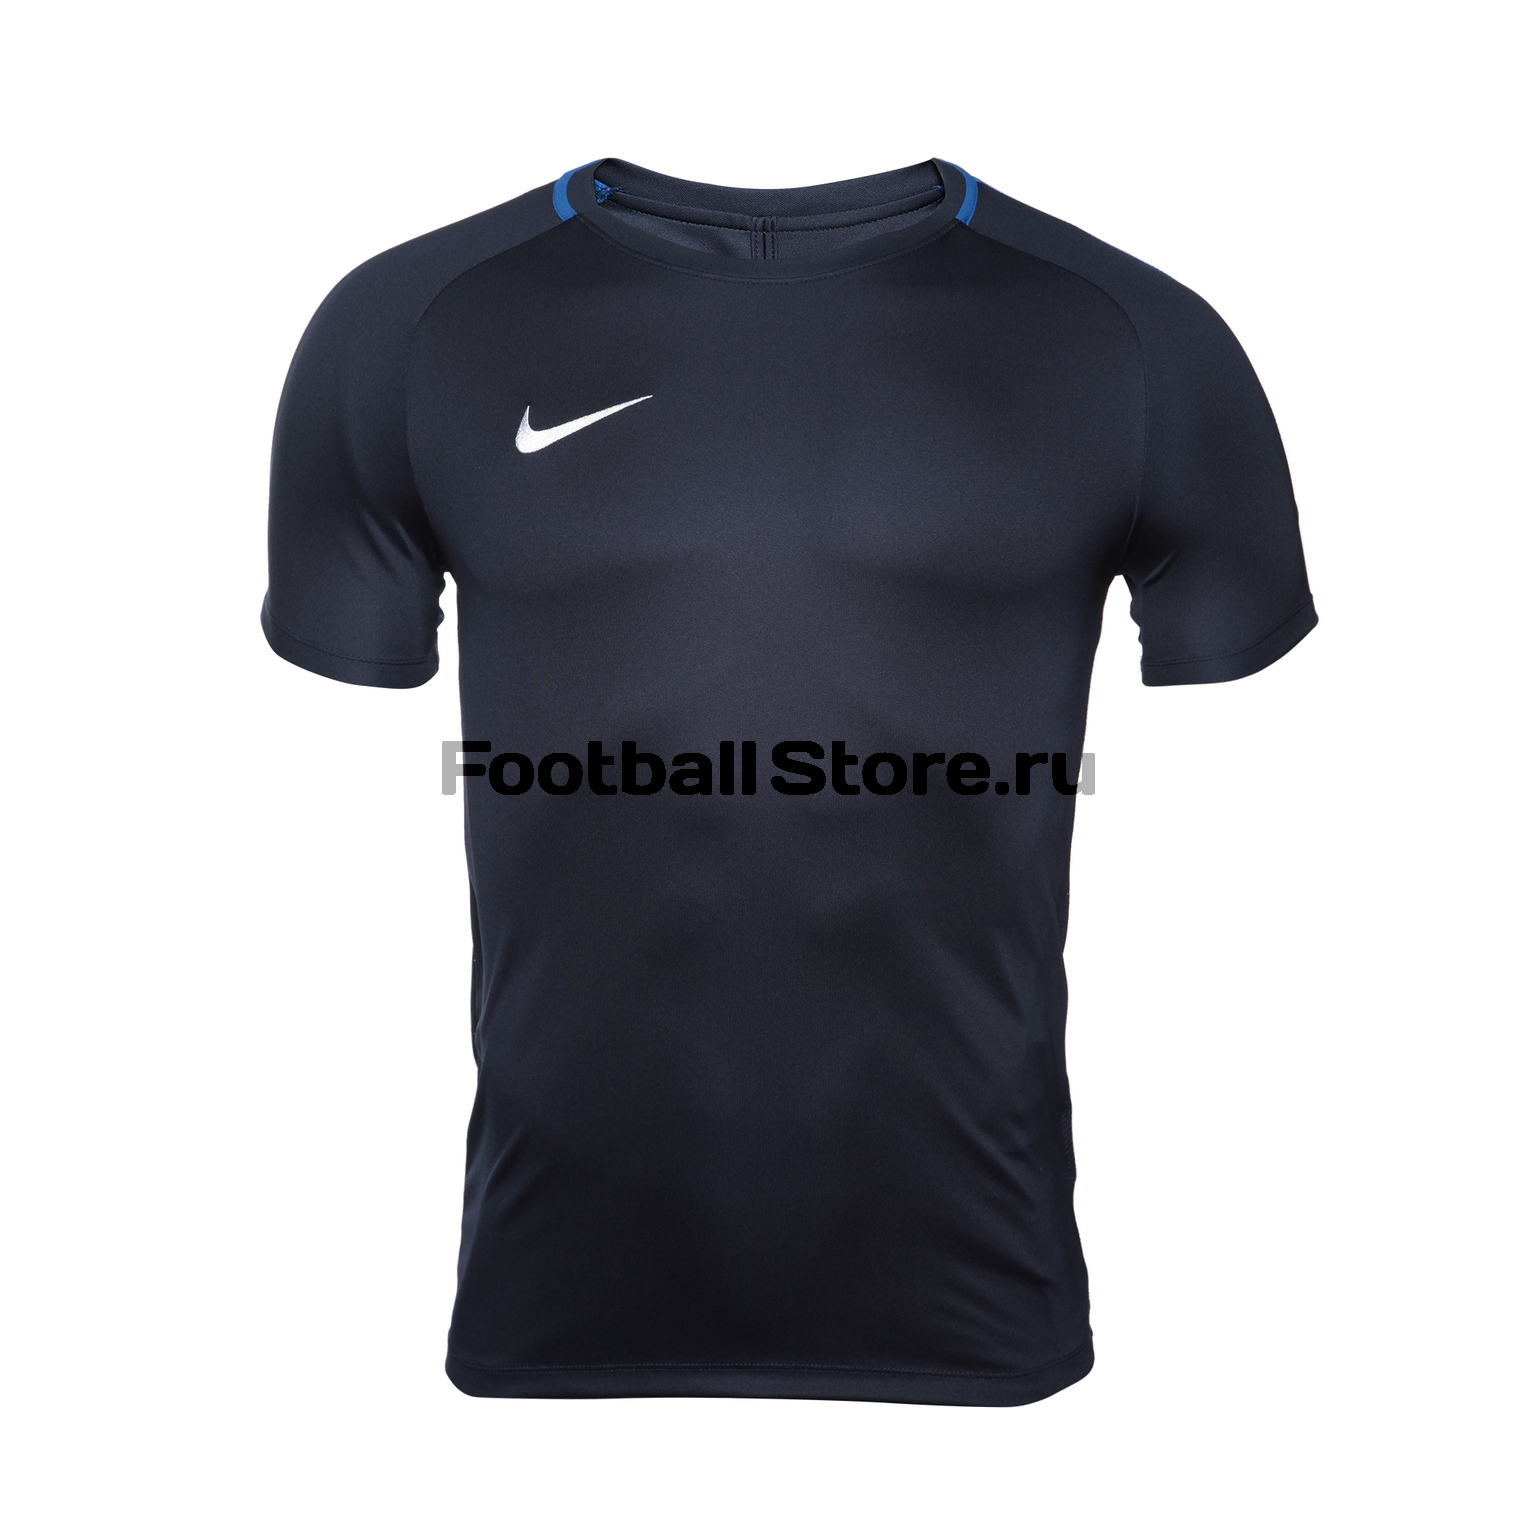 Футболка тренировочная Nike Dry Academy18 Top SS 893693-451